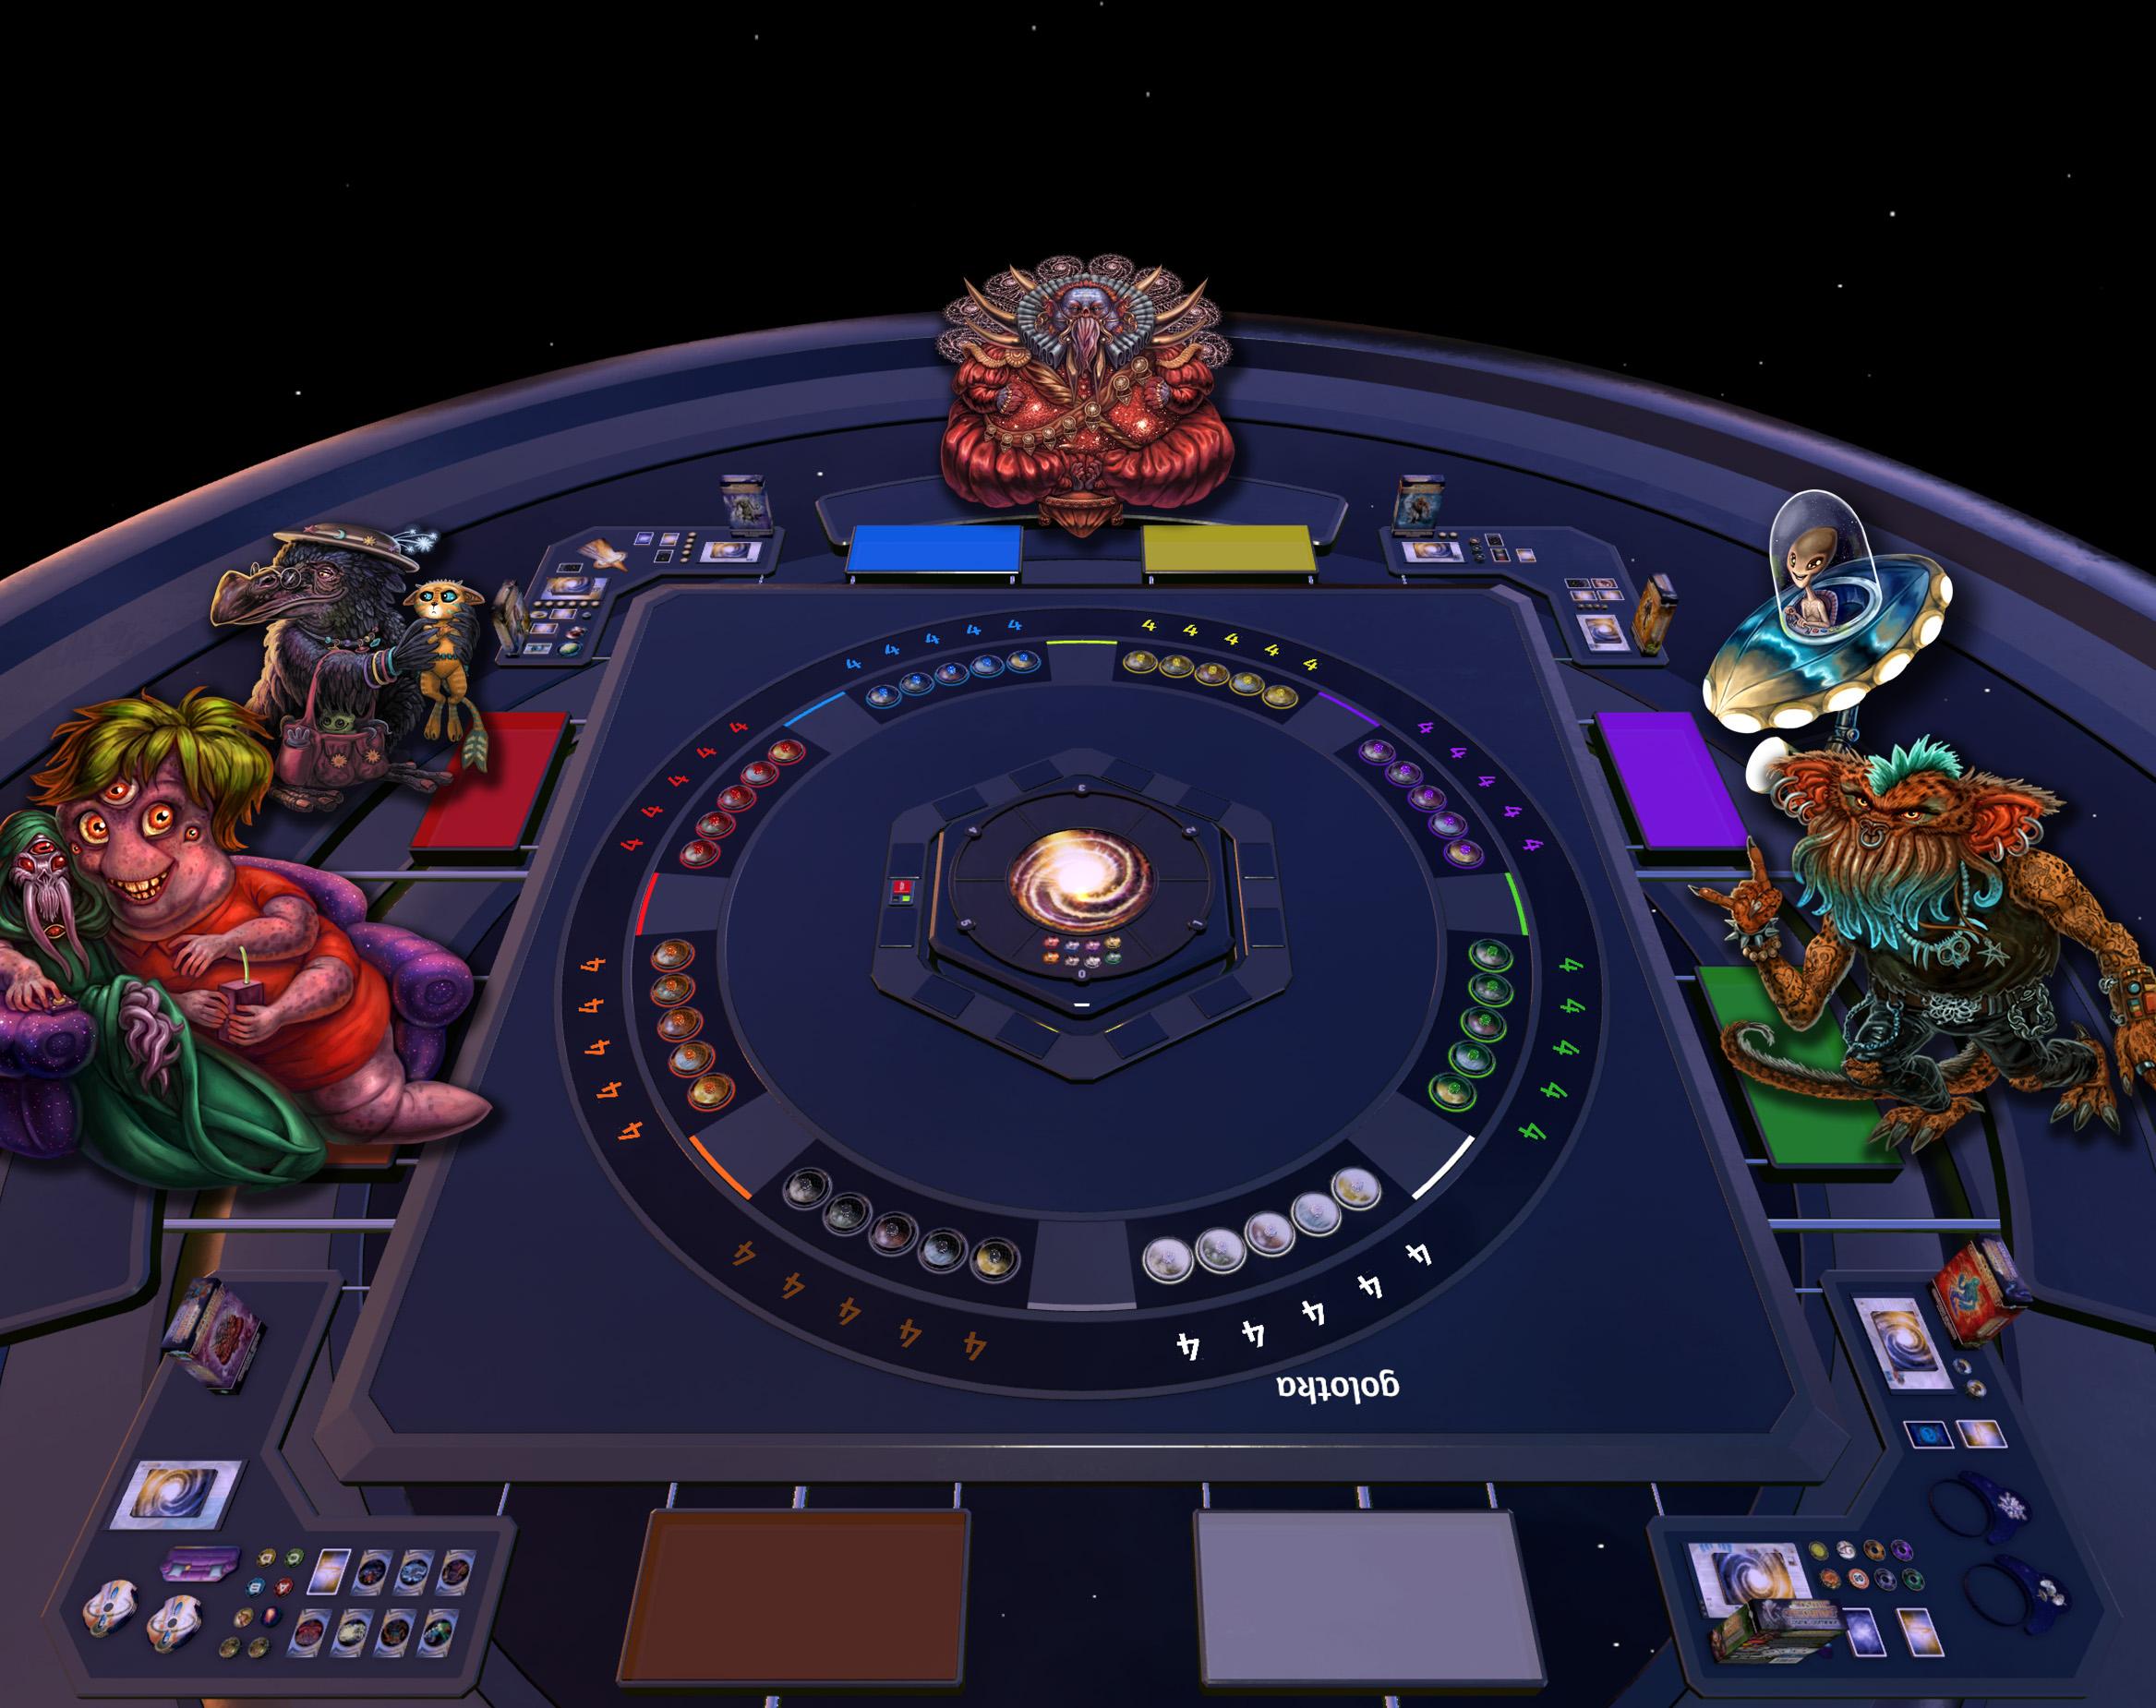 playnow-gamesetup7.jpg